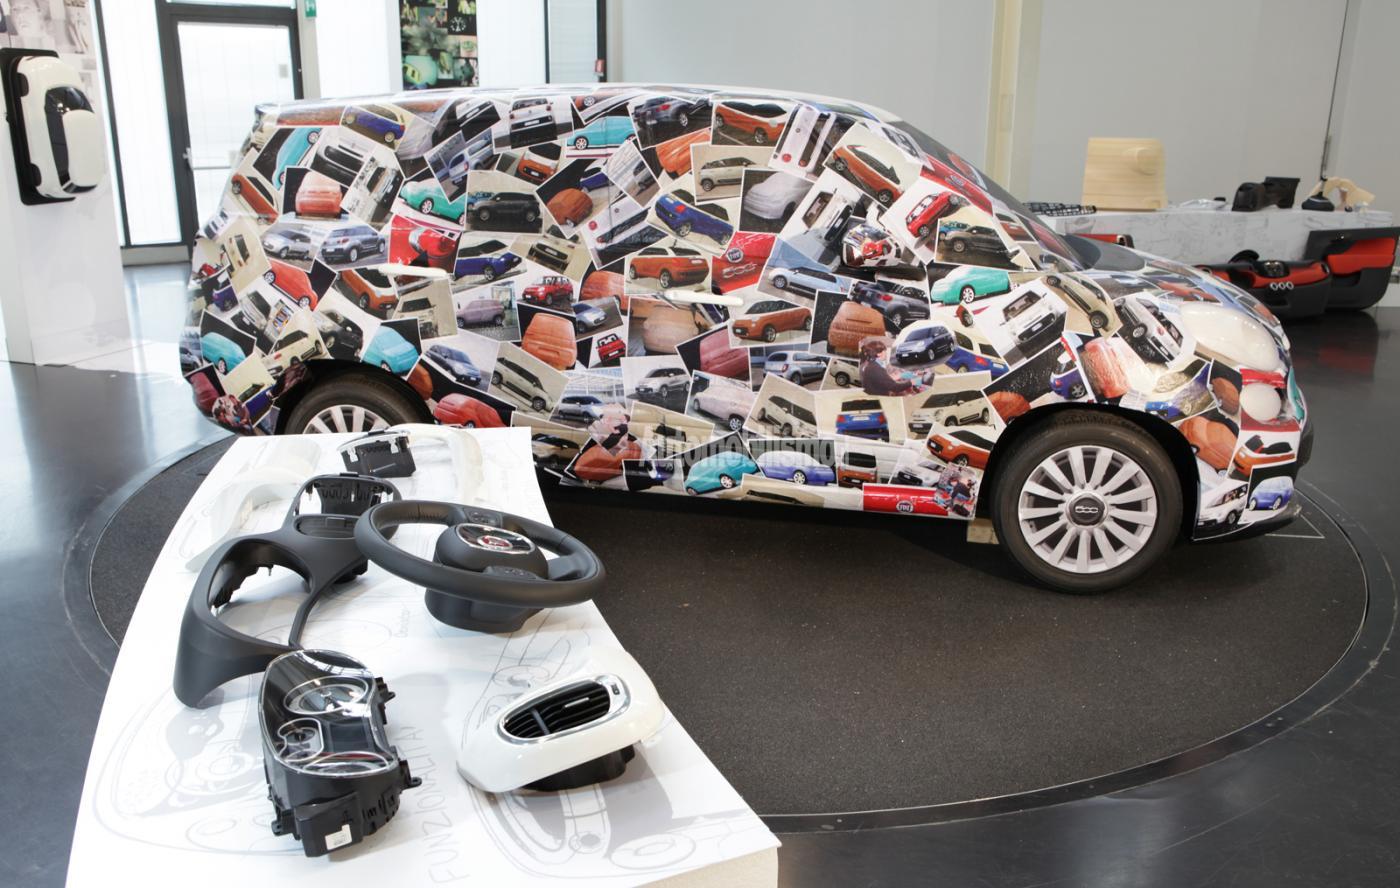 2013 Renault Talisman Release Date Price Spy Specs | 2017 - 2018 Best Cars Reviews